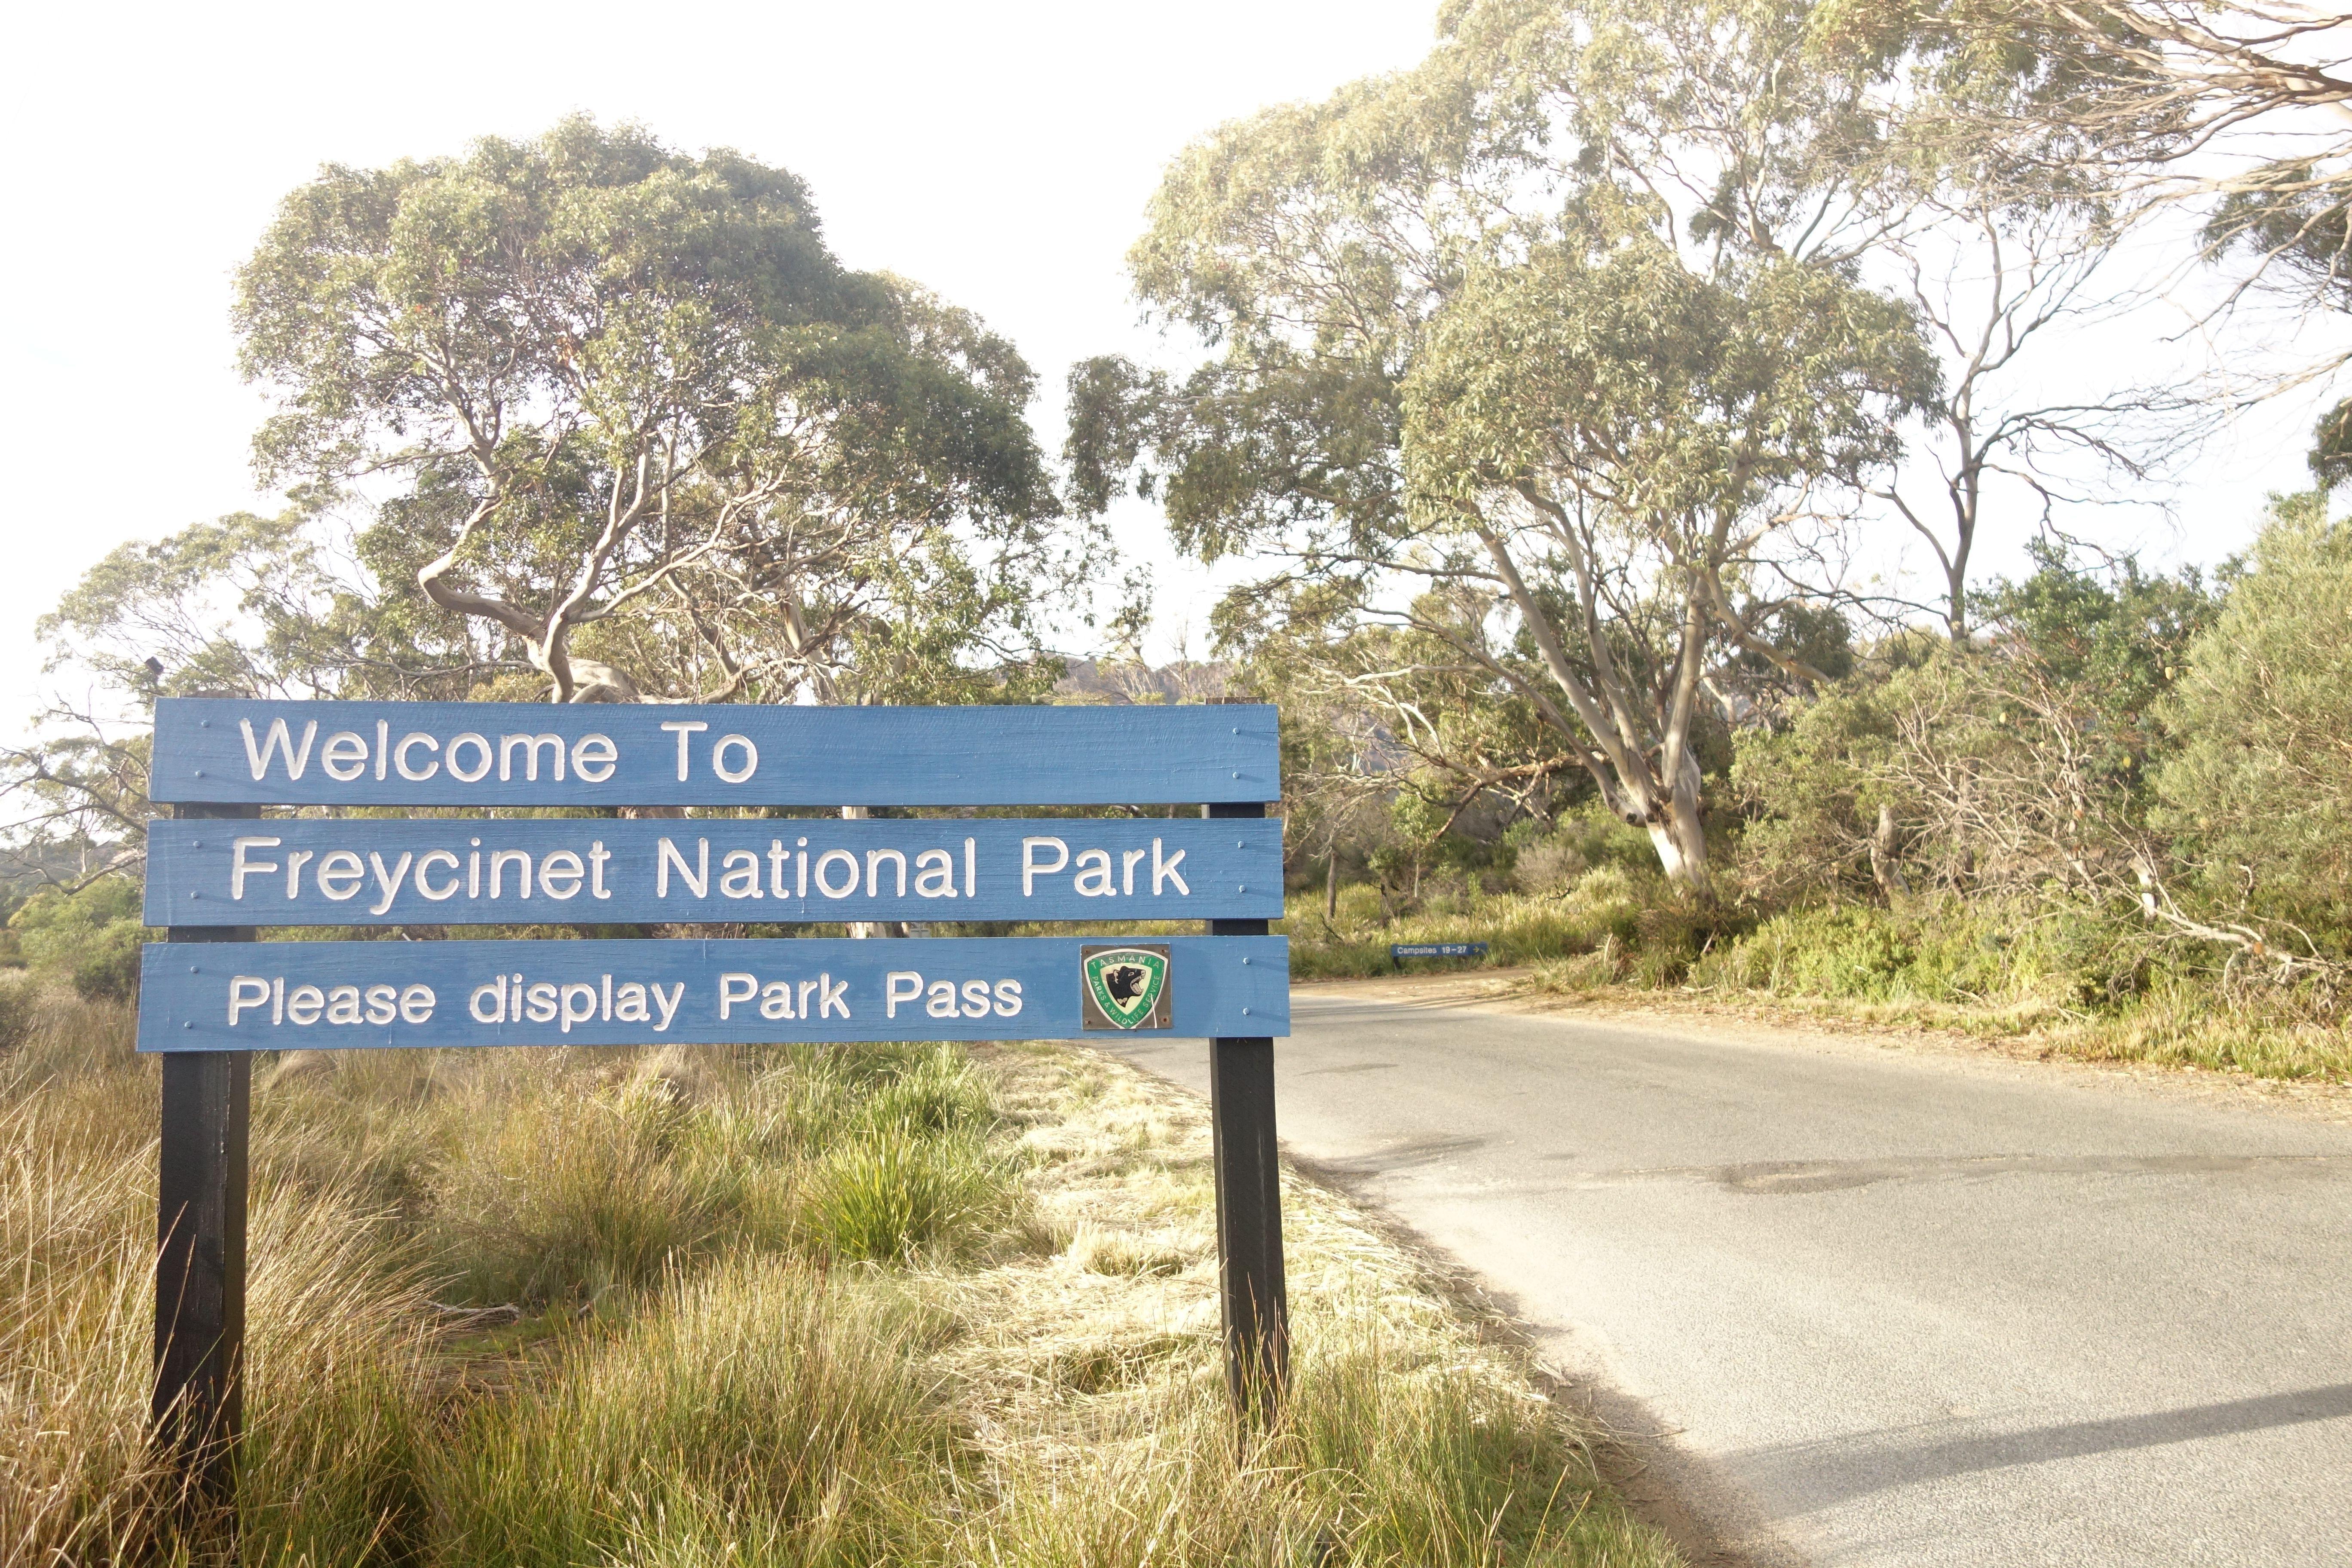 Australie-Tasmanie: Freycinet National Park